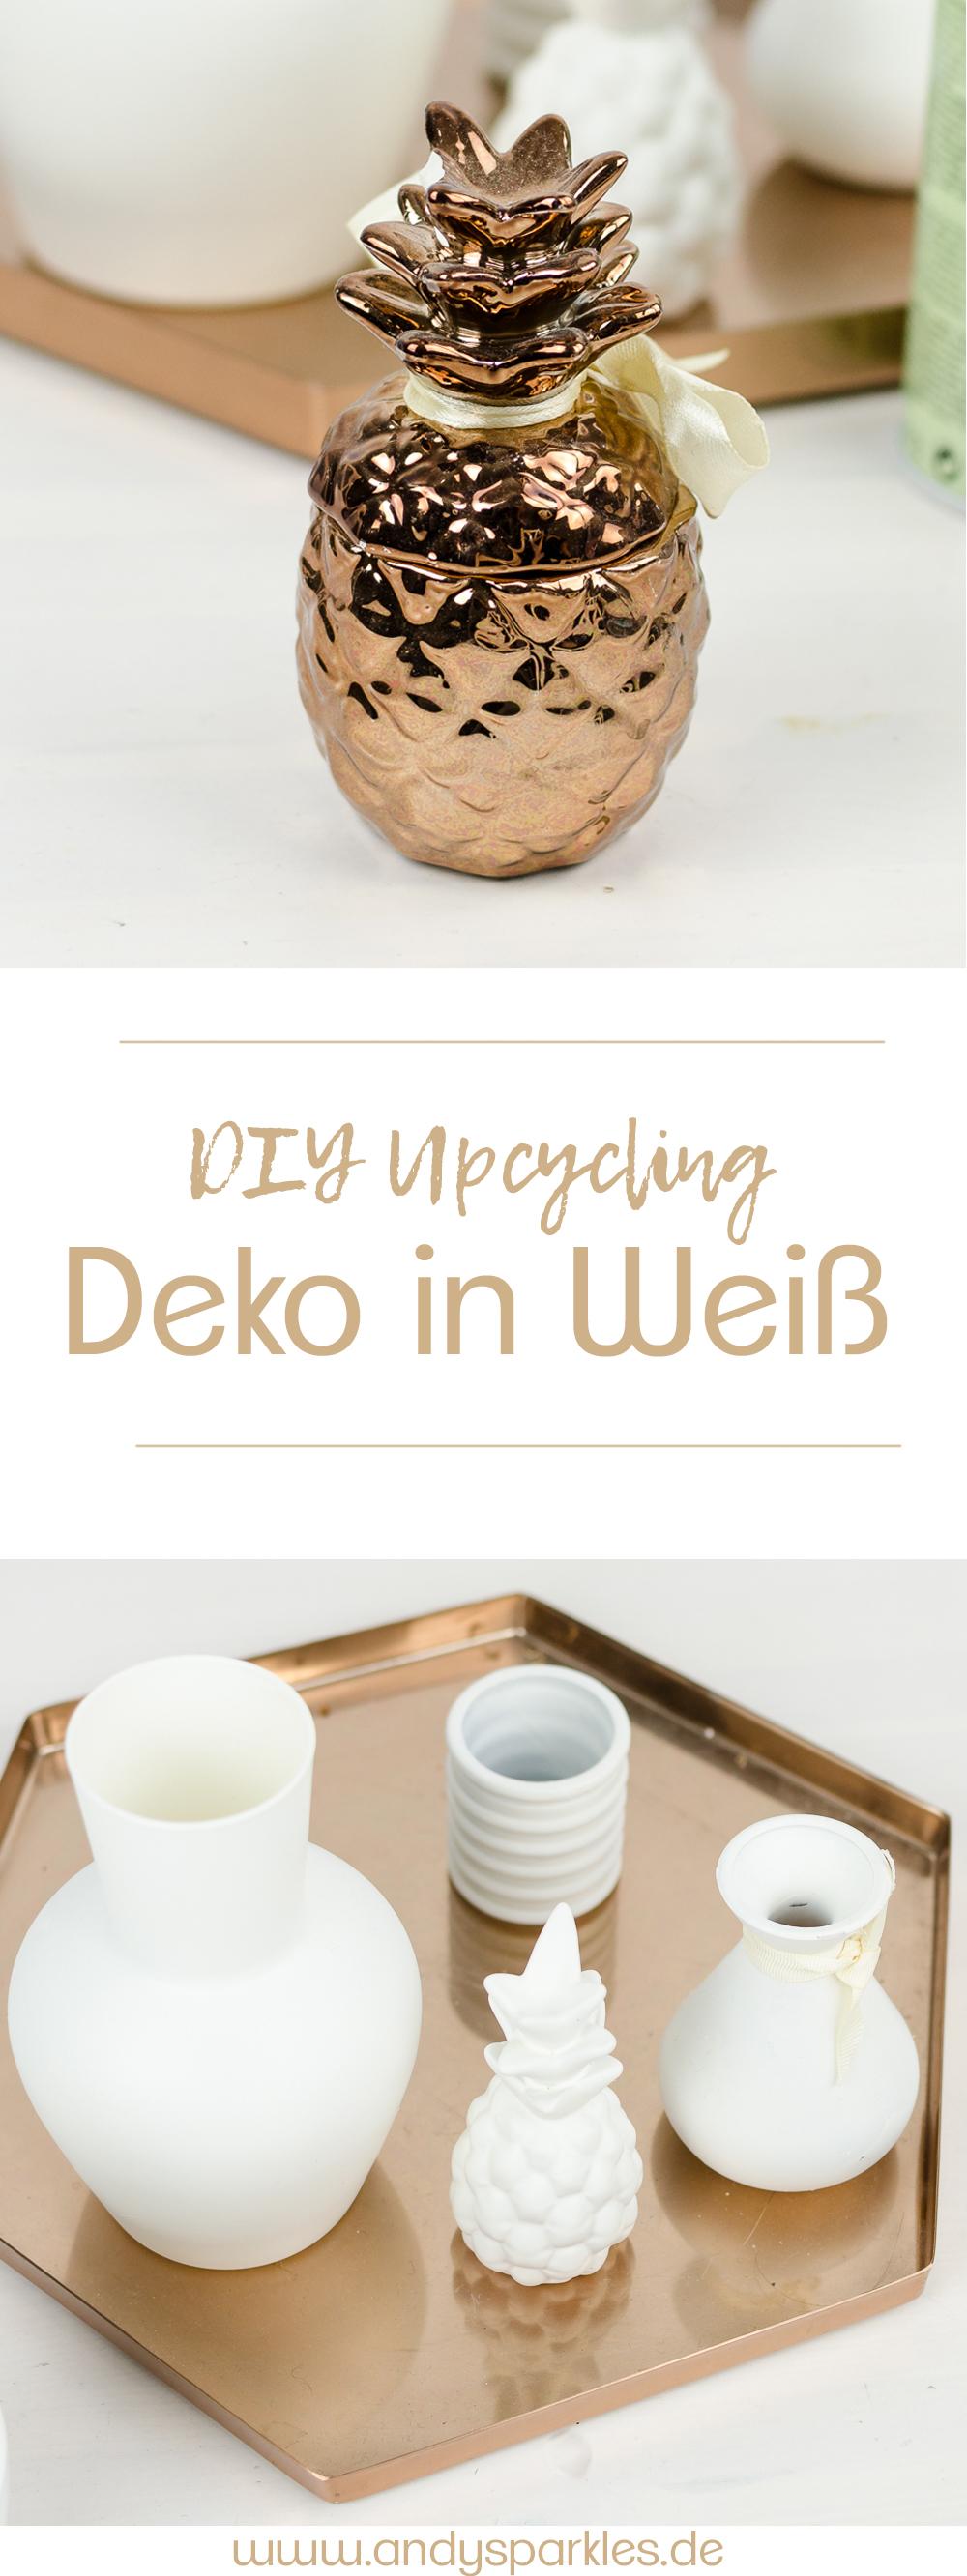 Upcycling DIY-Dekoflaschen selbst machen-Deko DIY-andysparkles.de